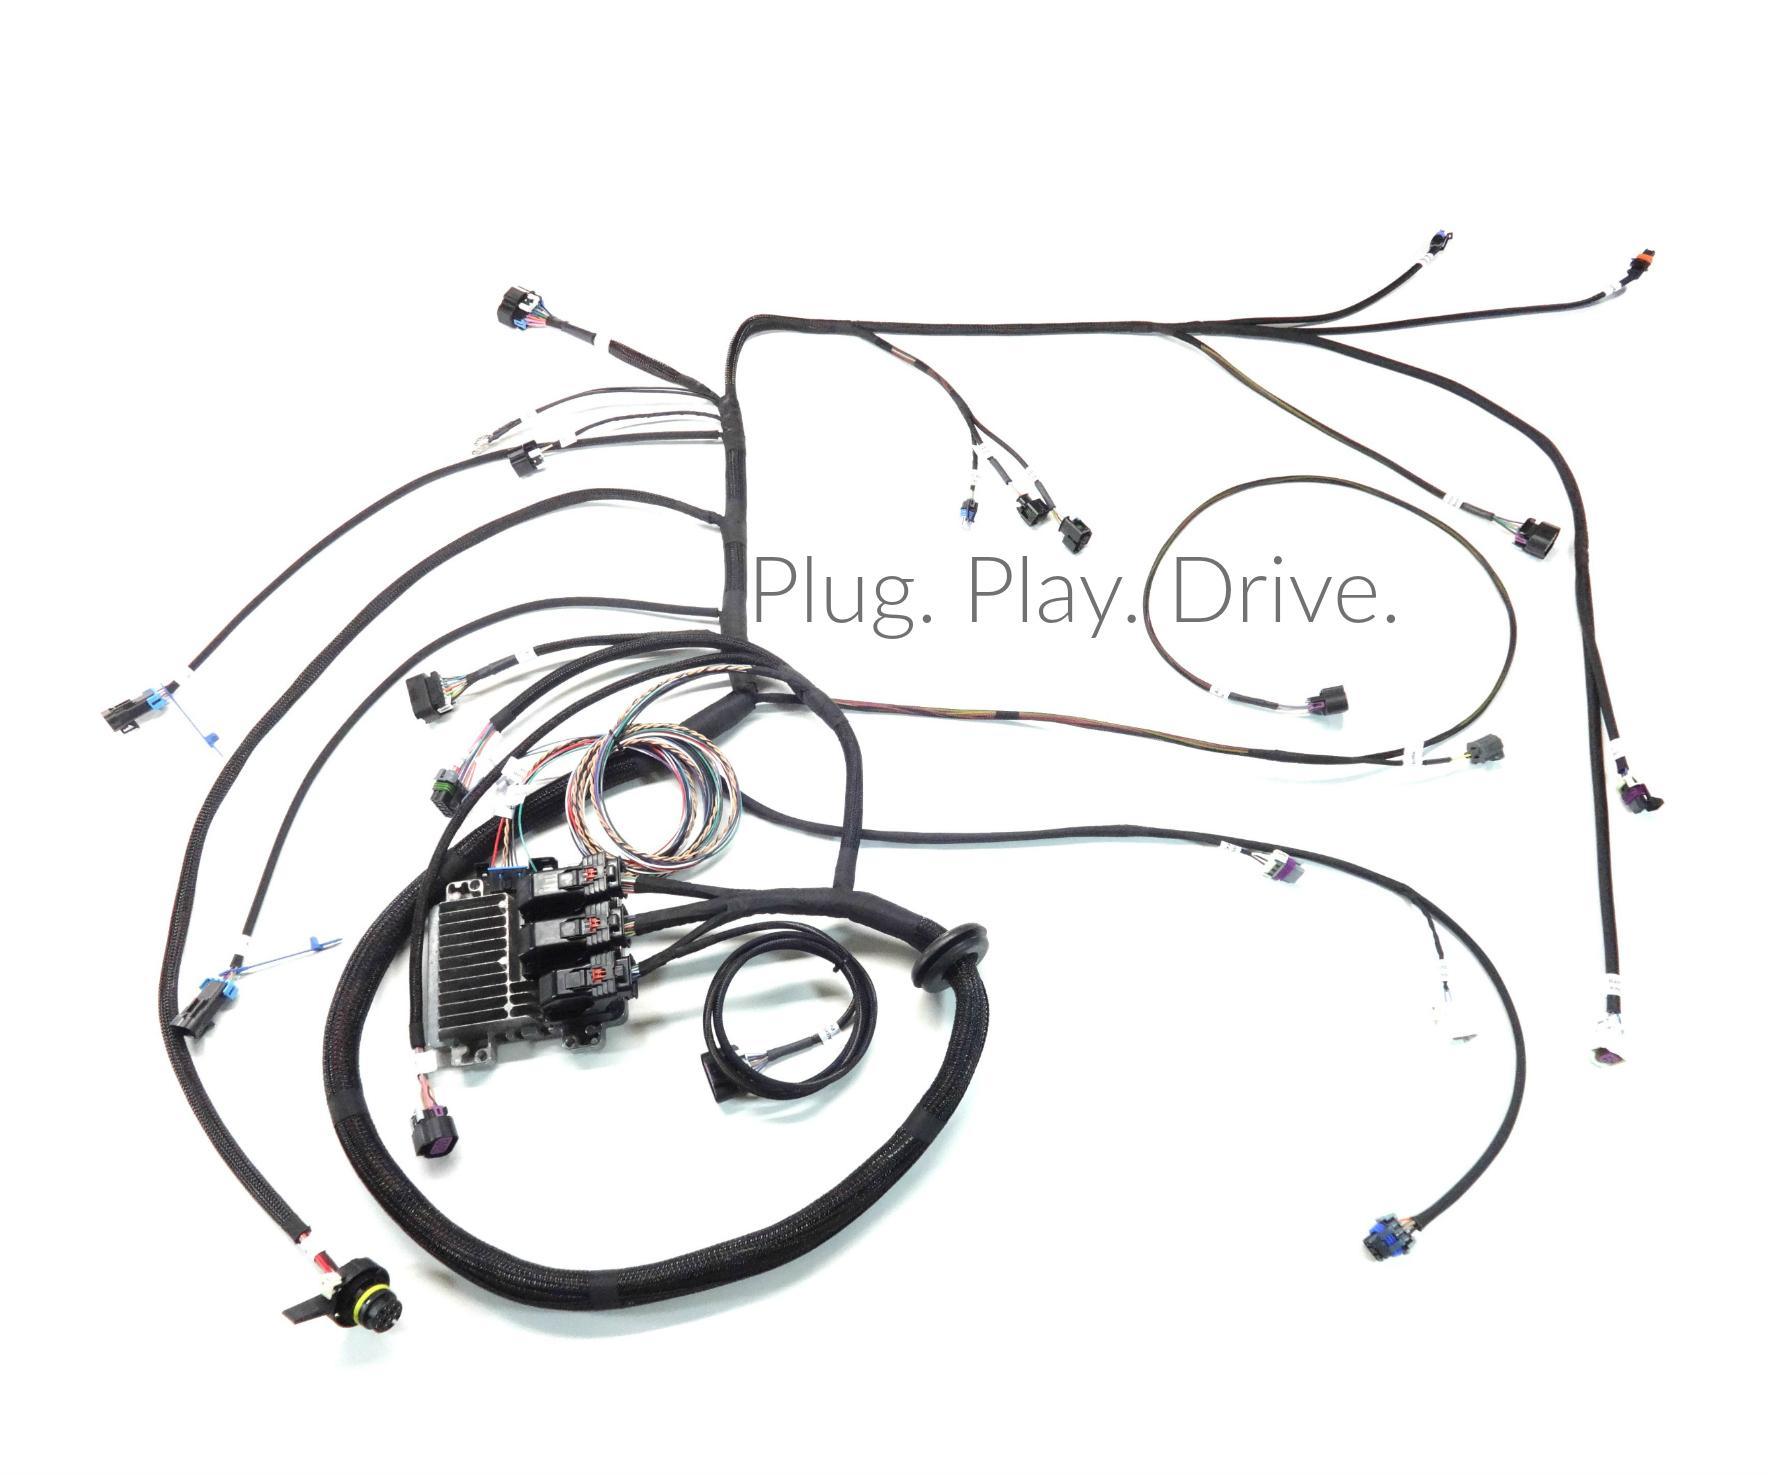 lq4 wiring harness instructions